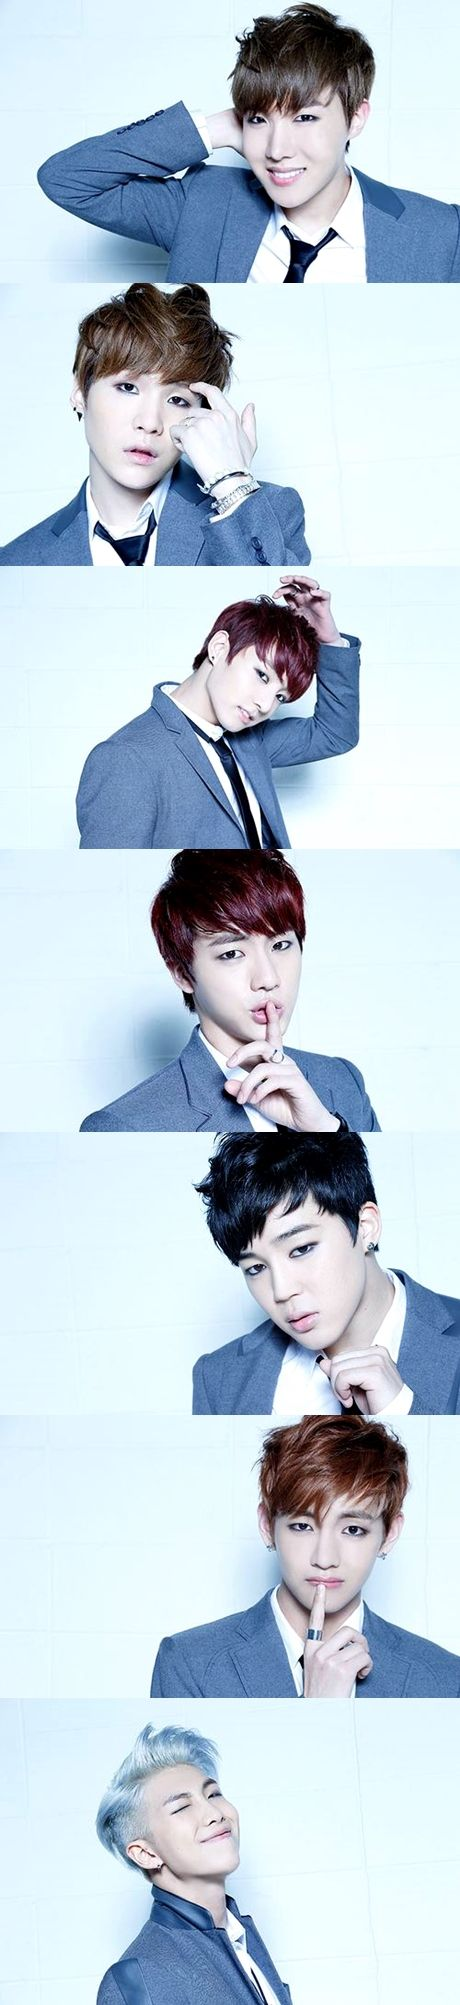 J-Hope + Suga + Jungkook + Jin + Jimin + V + Rap Monster = BTS